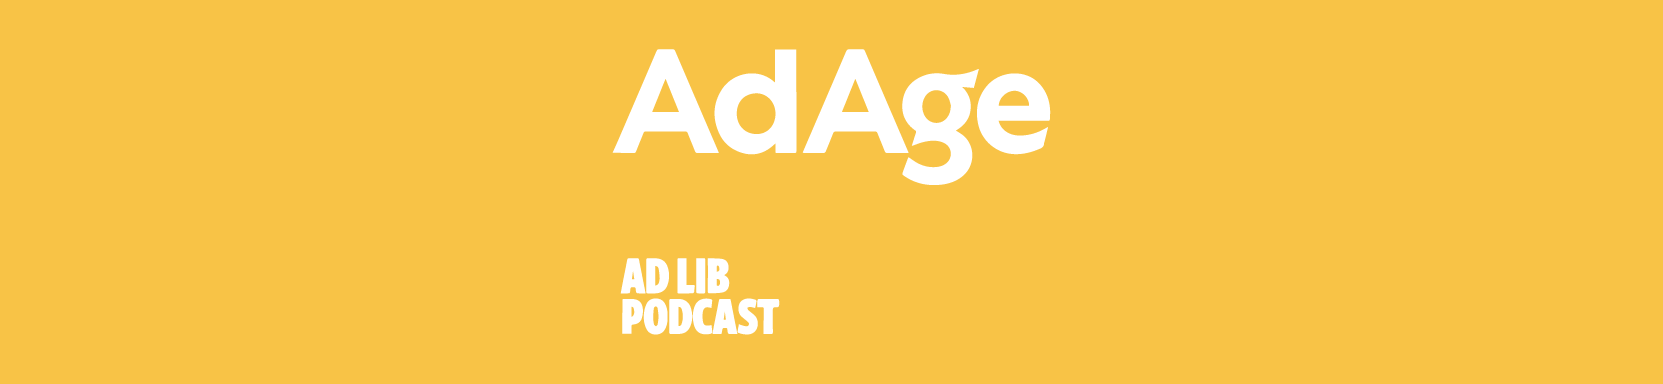 AdAge AdLab Podcast